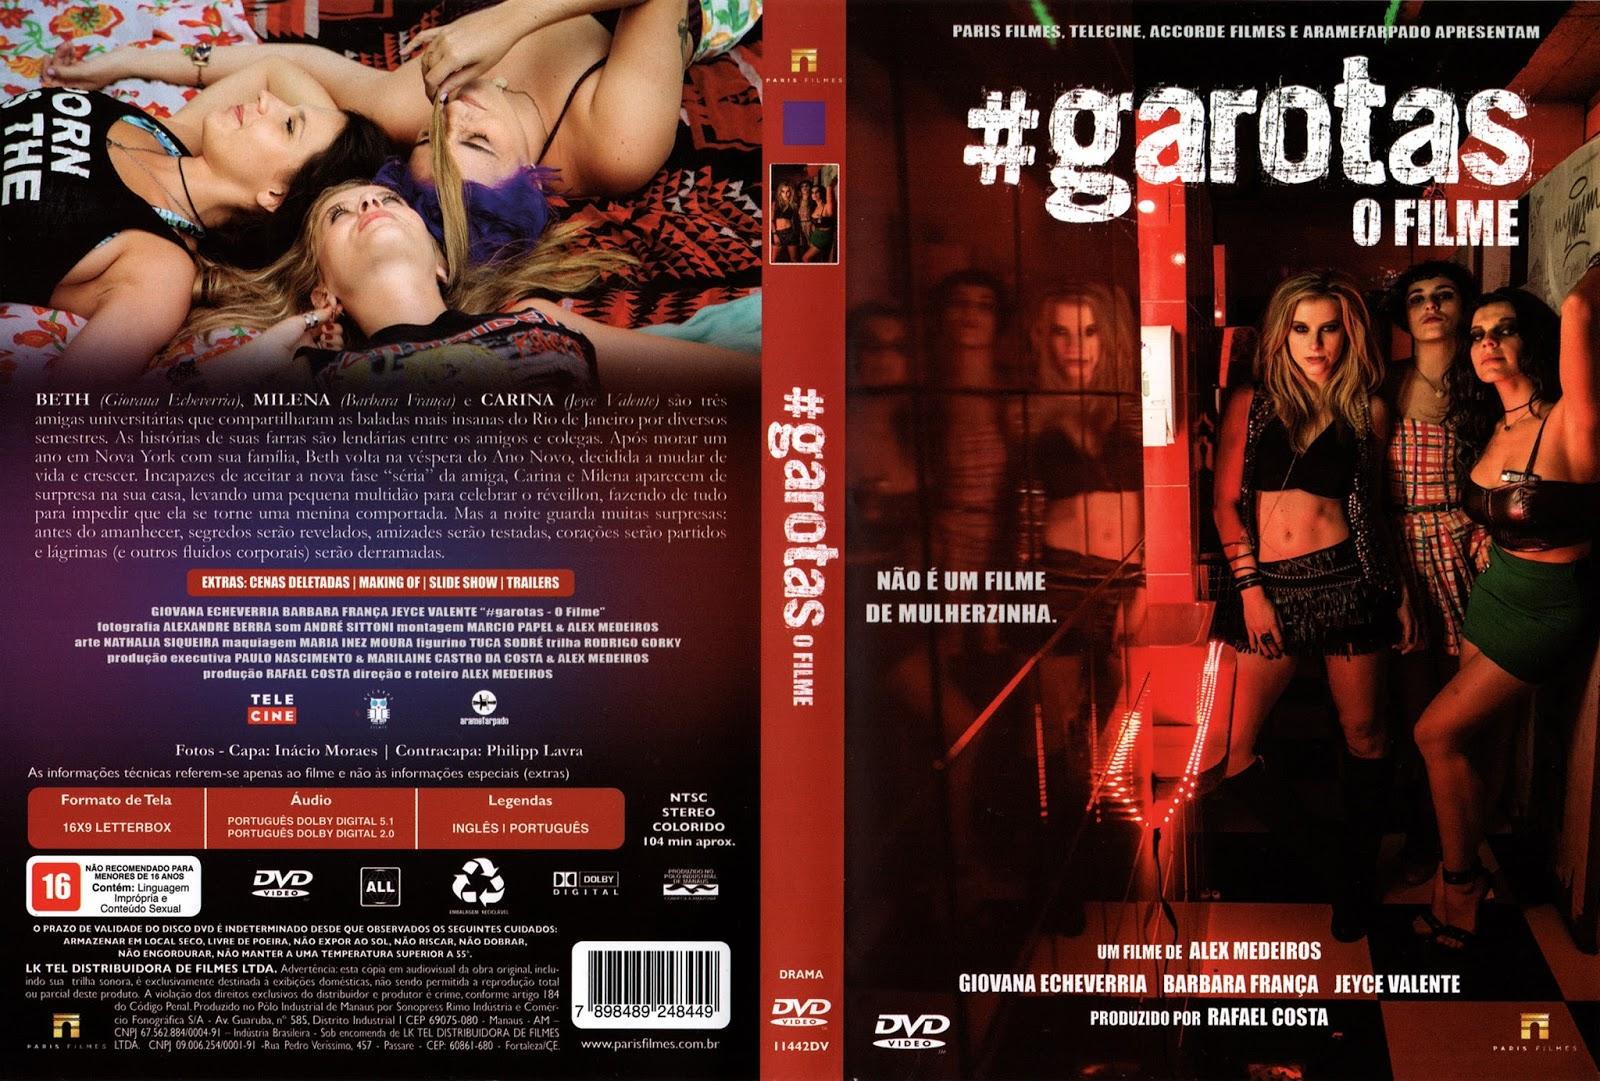 #Garotas O Filme DVDRip XviD Nacional  2523Garotas 2B 25E2 2580 2593 2BO 2BFilme 2B  2BXANDAODOWNLOAD